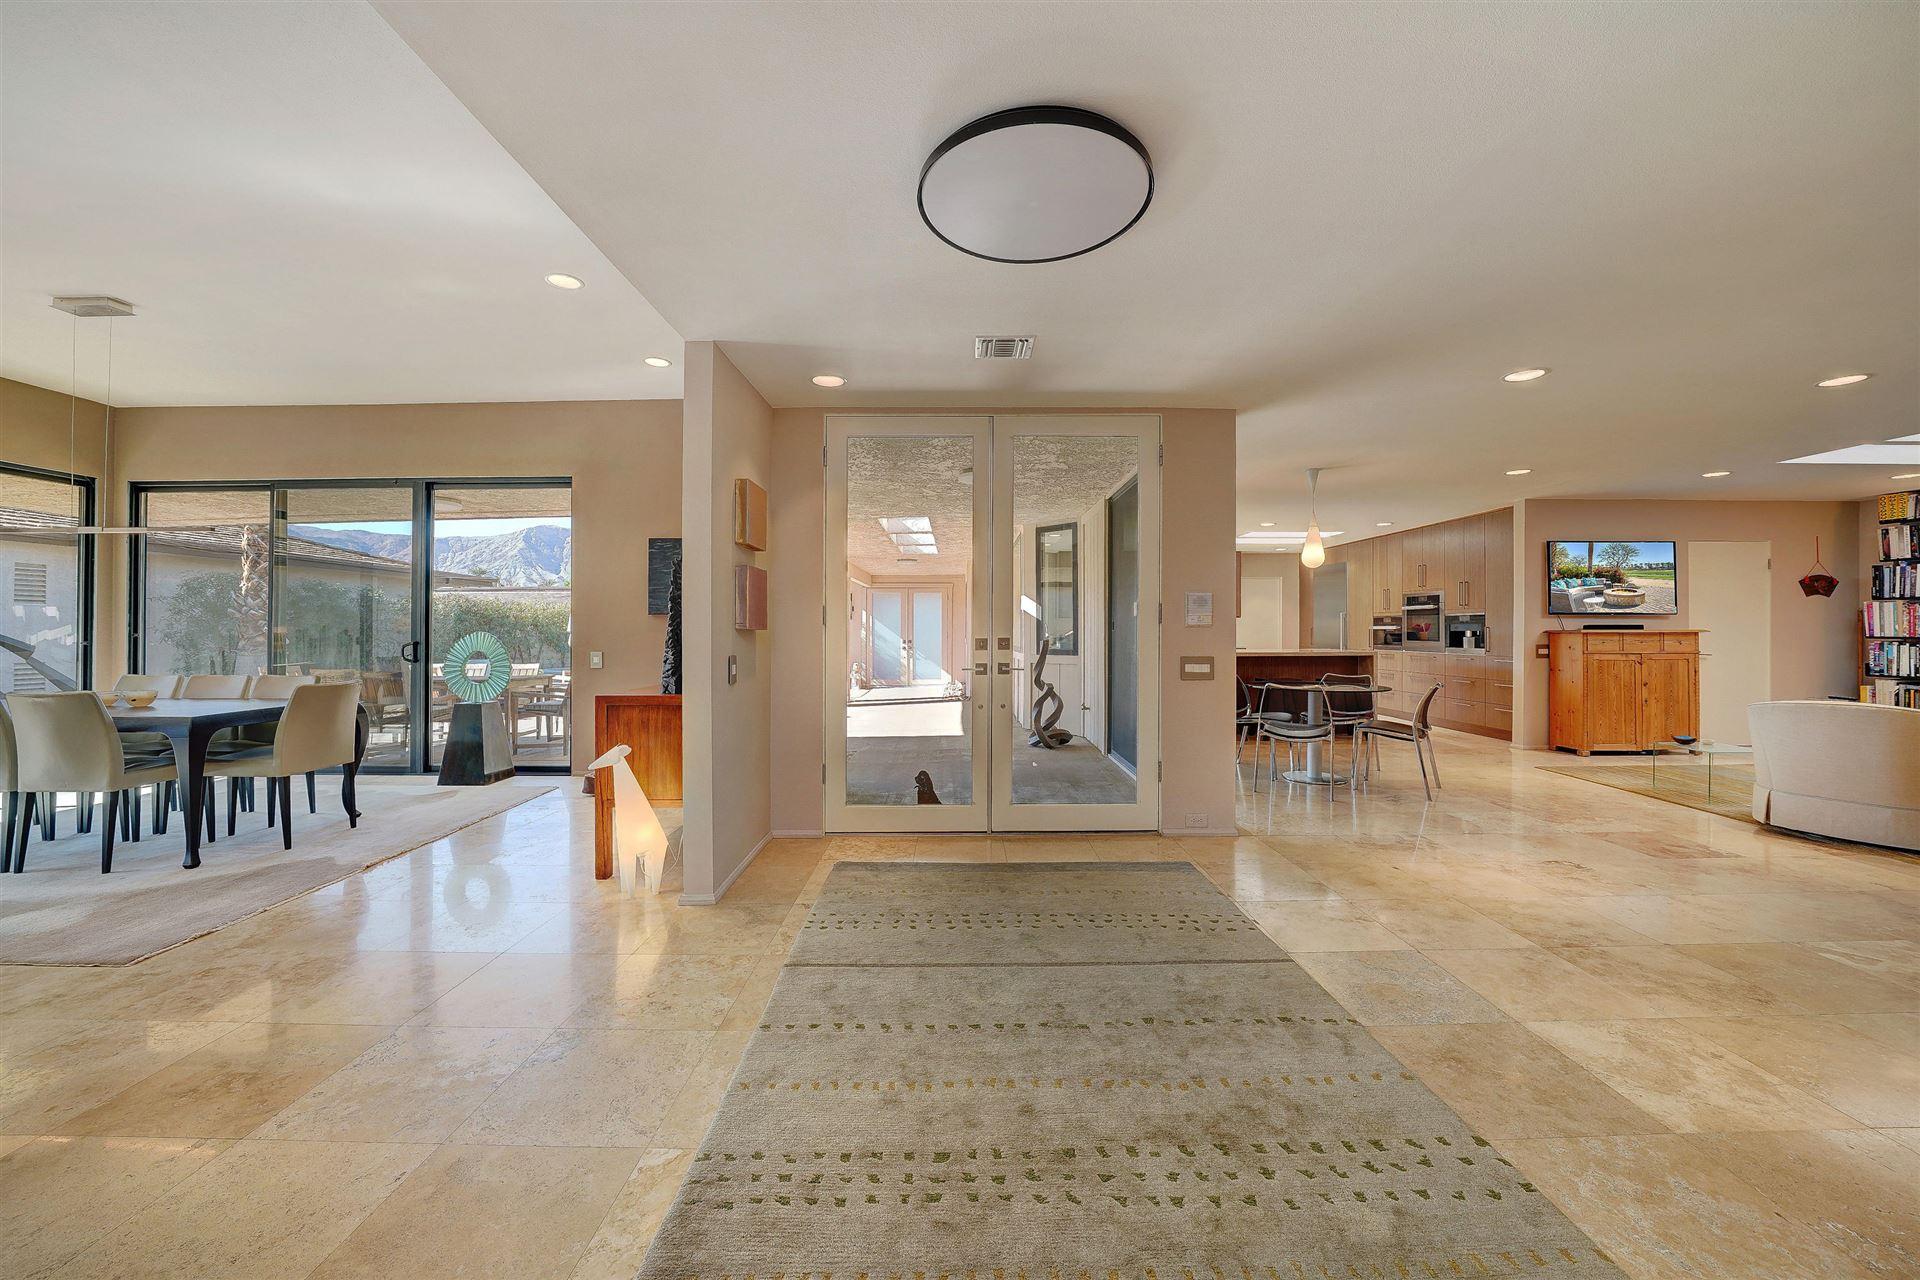 8 Dartmouth Drive, Rancho Mirage, CA 92270 - MLS#: 219037354